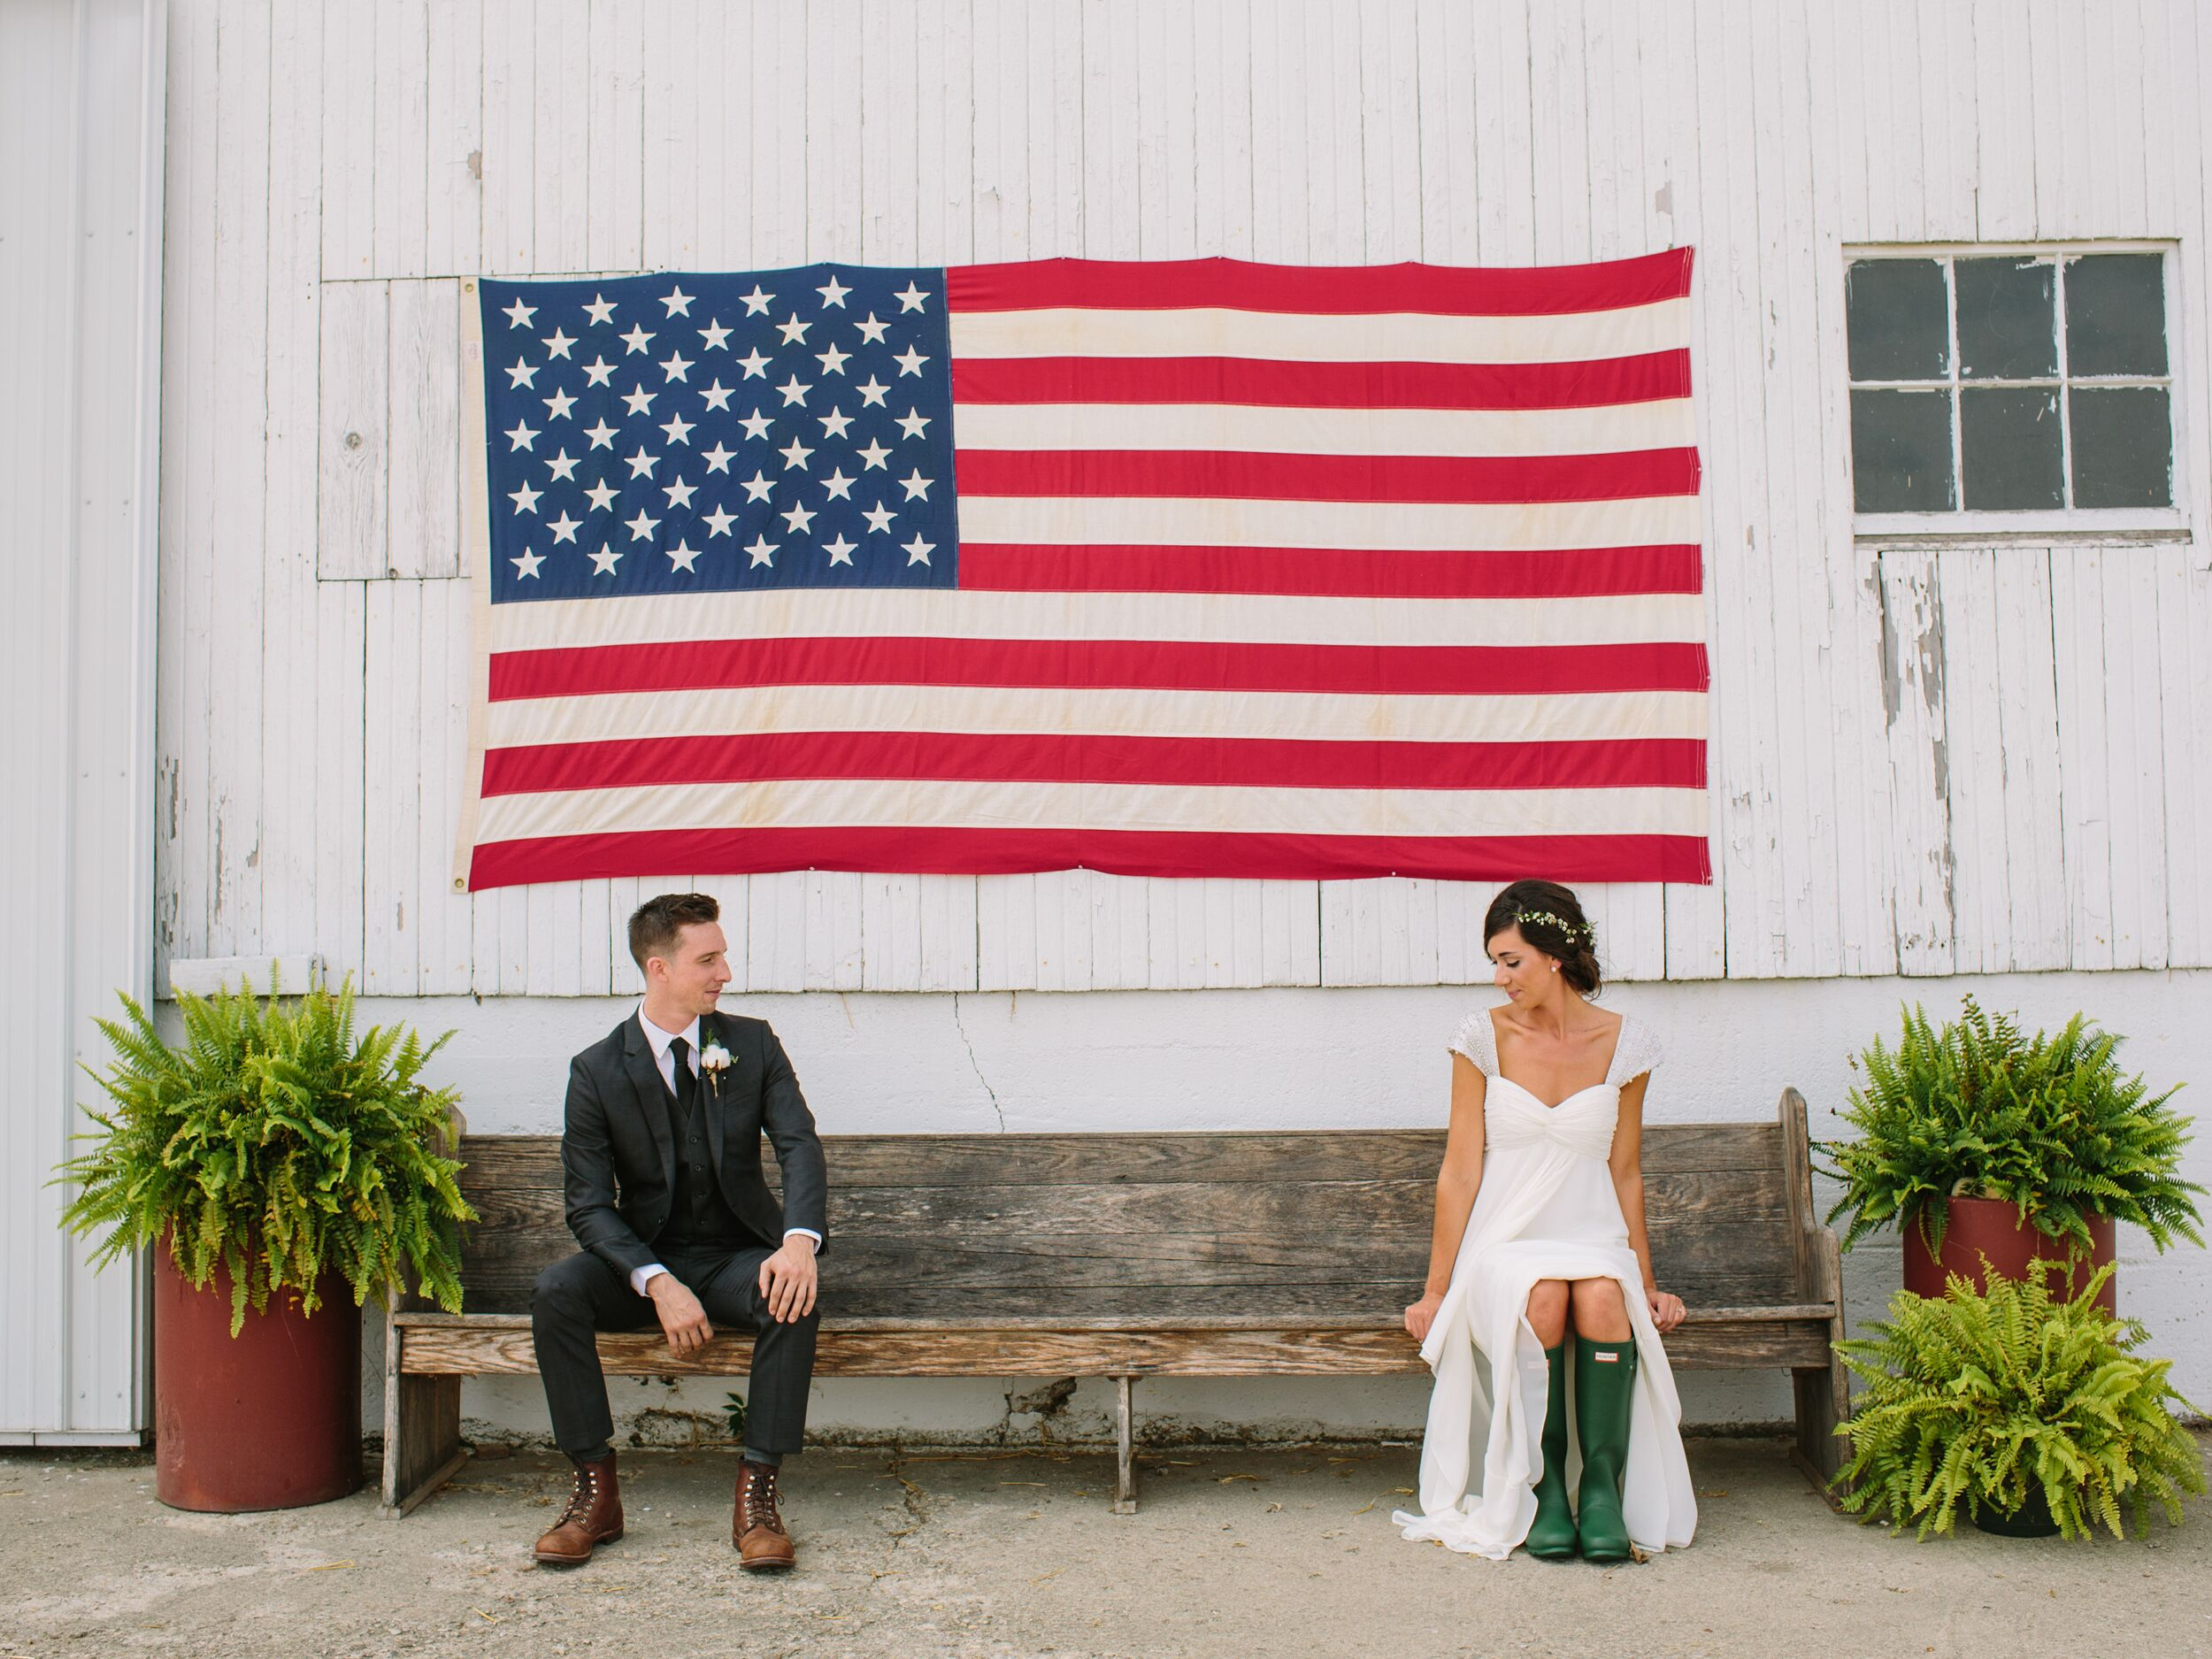 Americana Weddings: Your Americana Wedding Guide